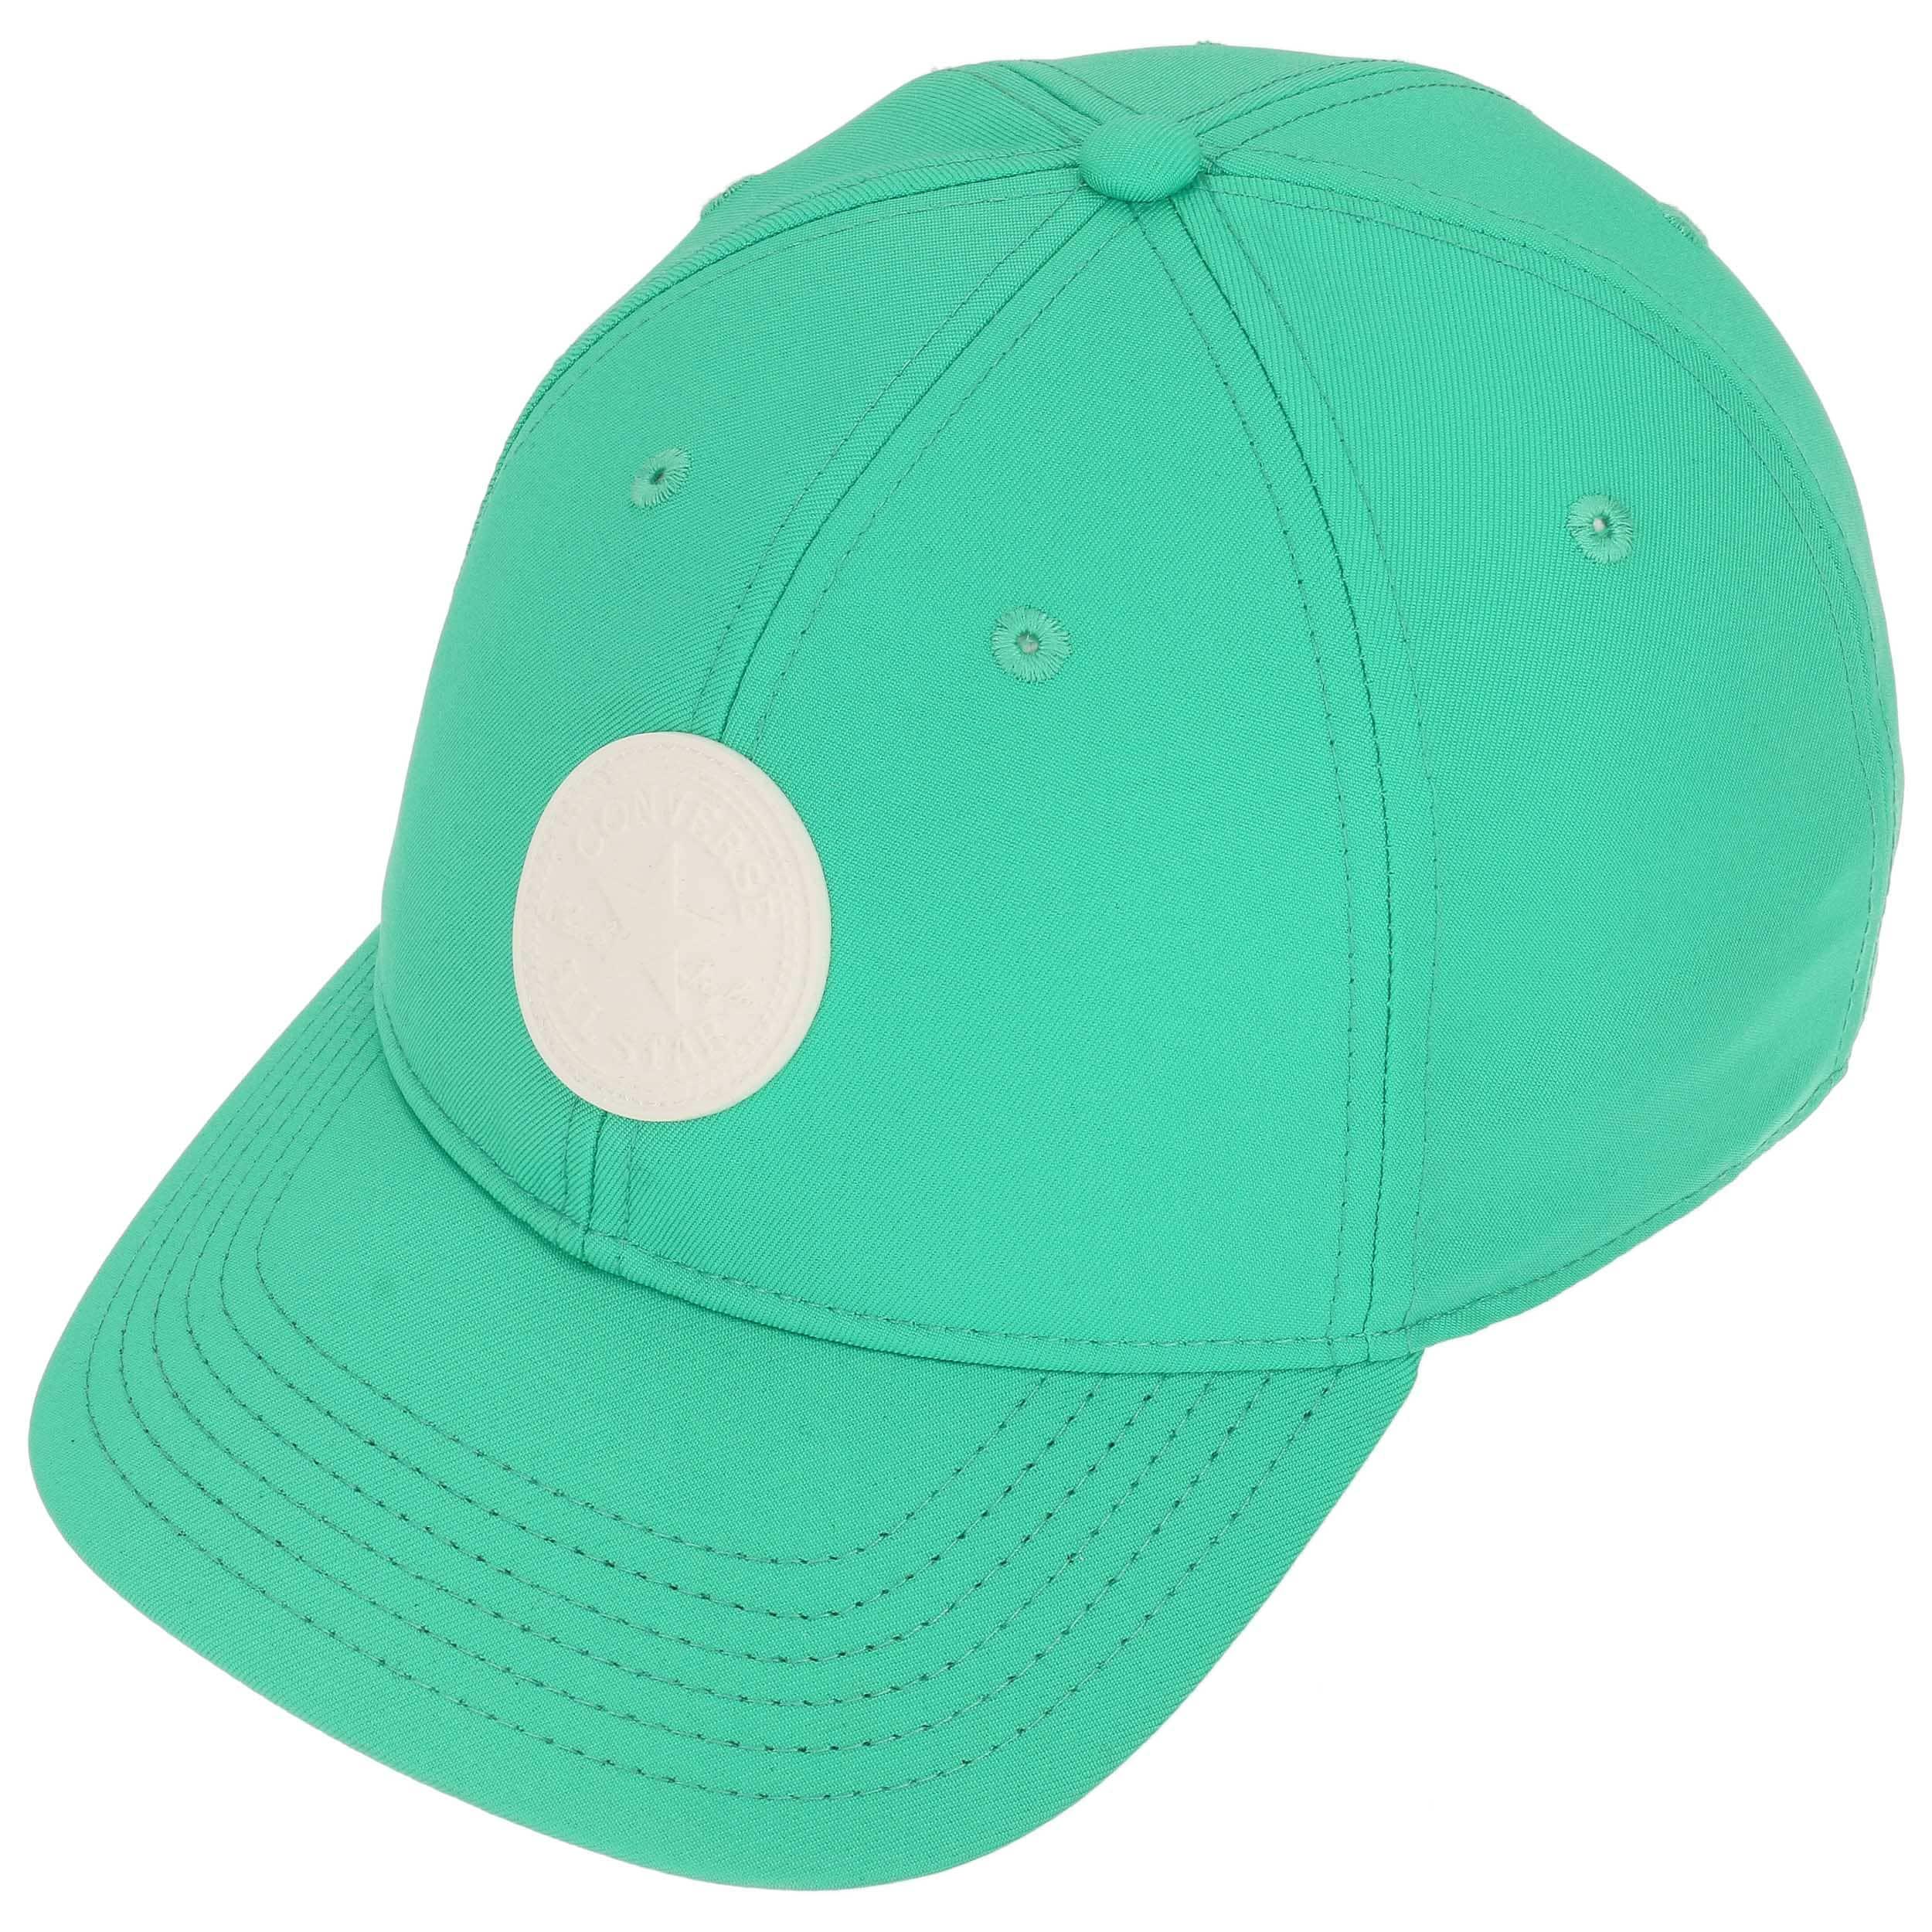 762d8423b88 ... Dry Short Visor Strapback Cap by Converse - mint green 1 ...